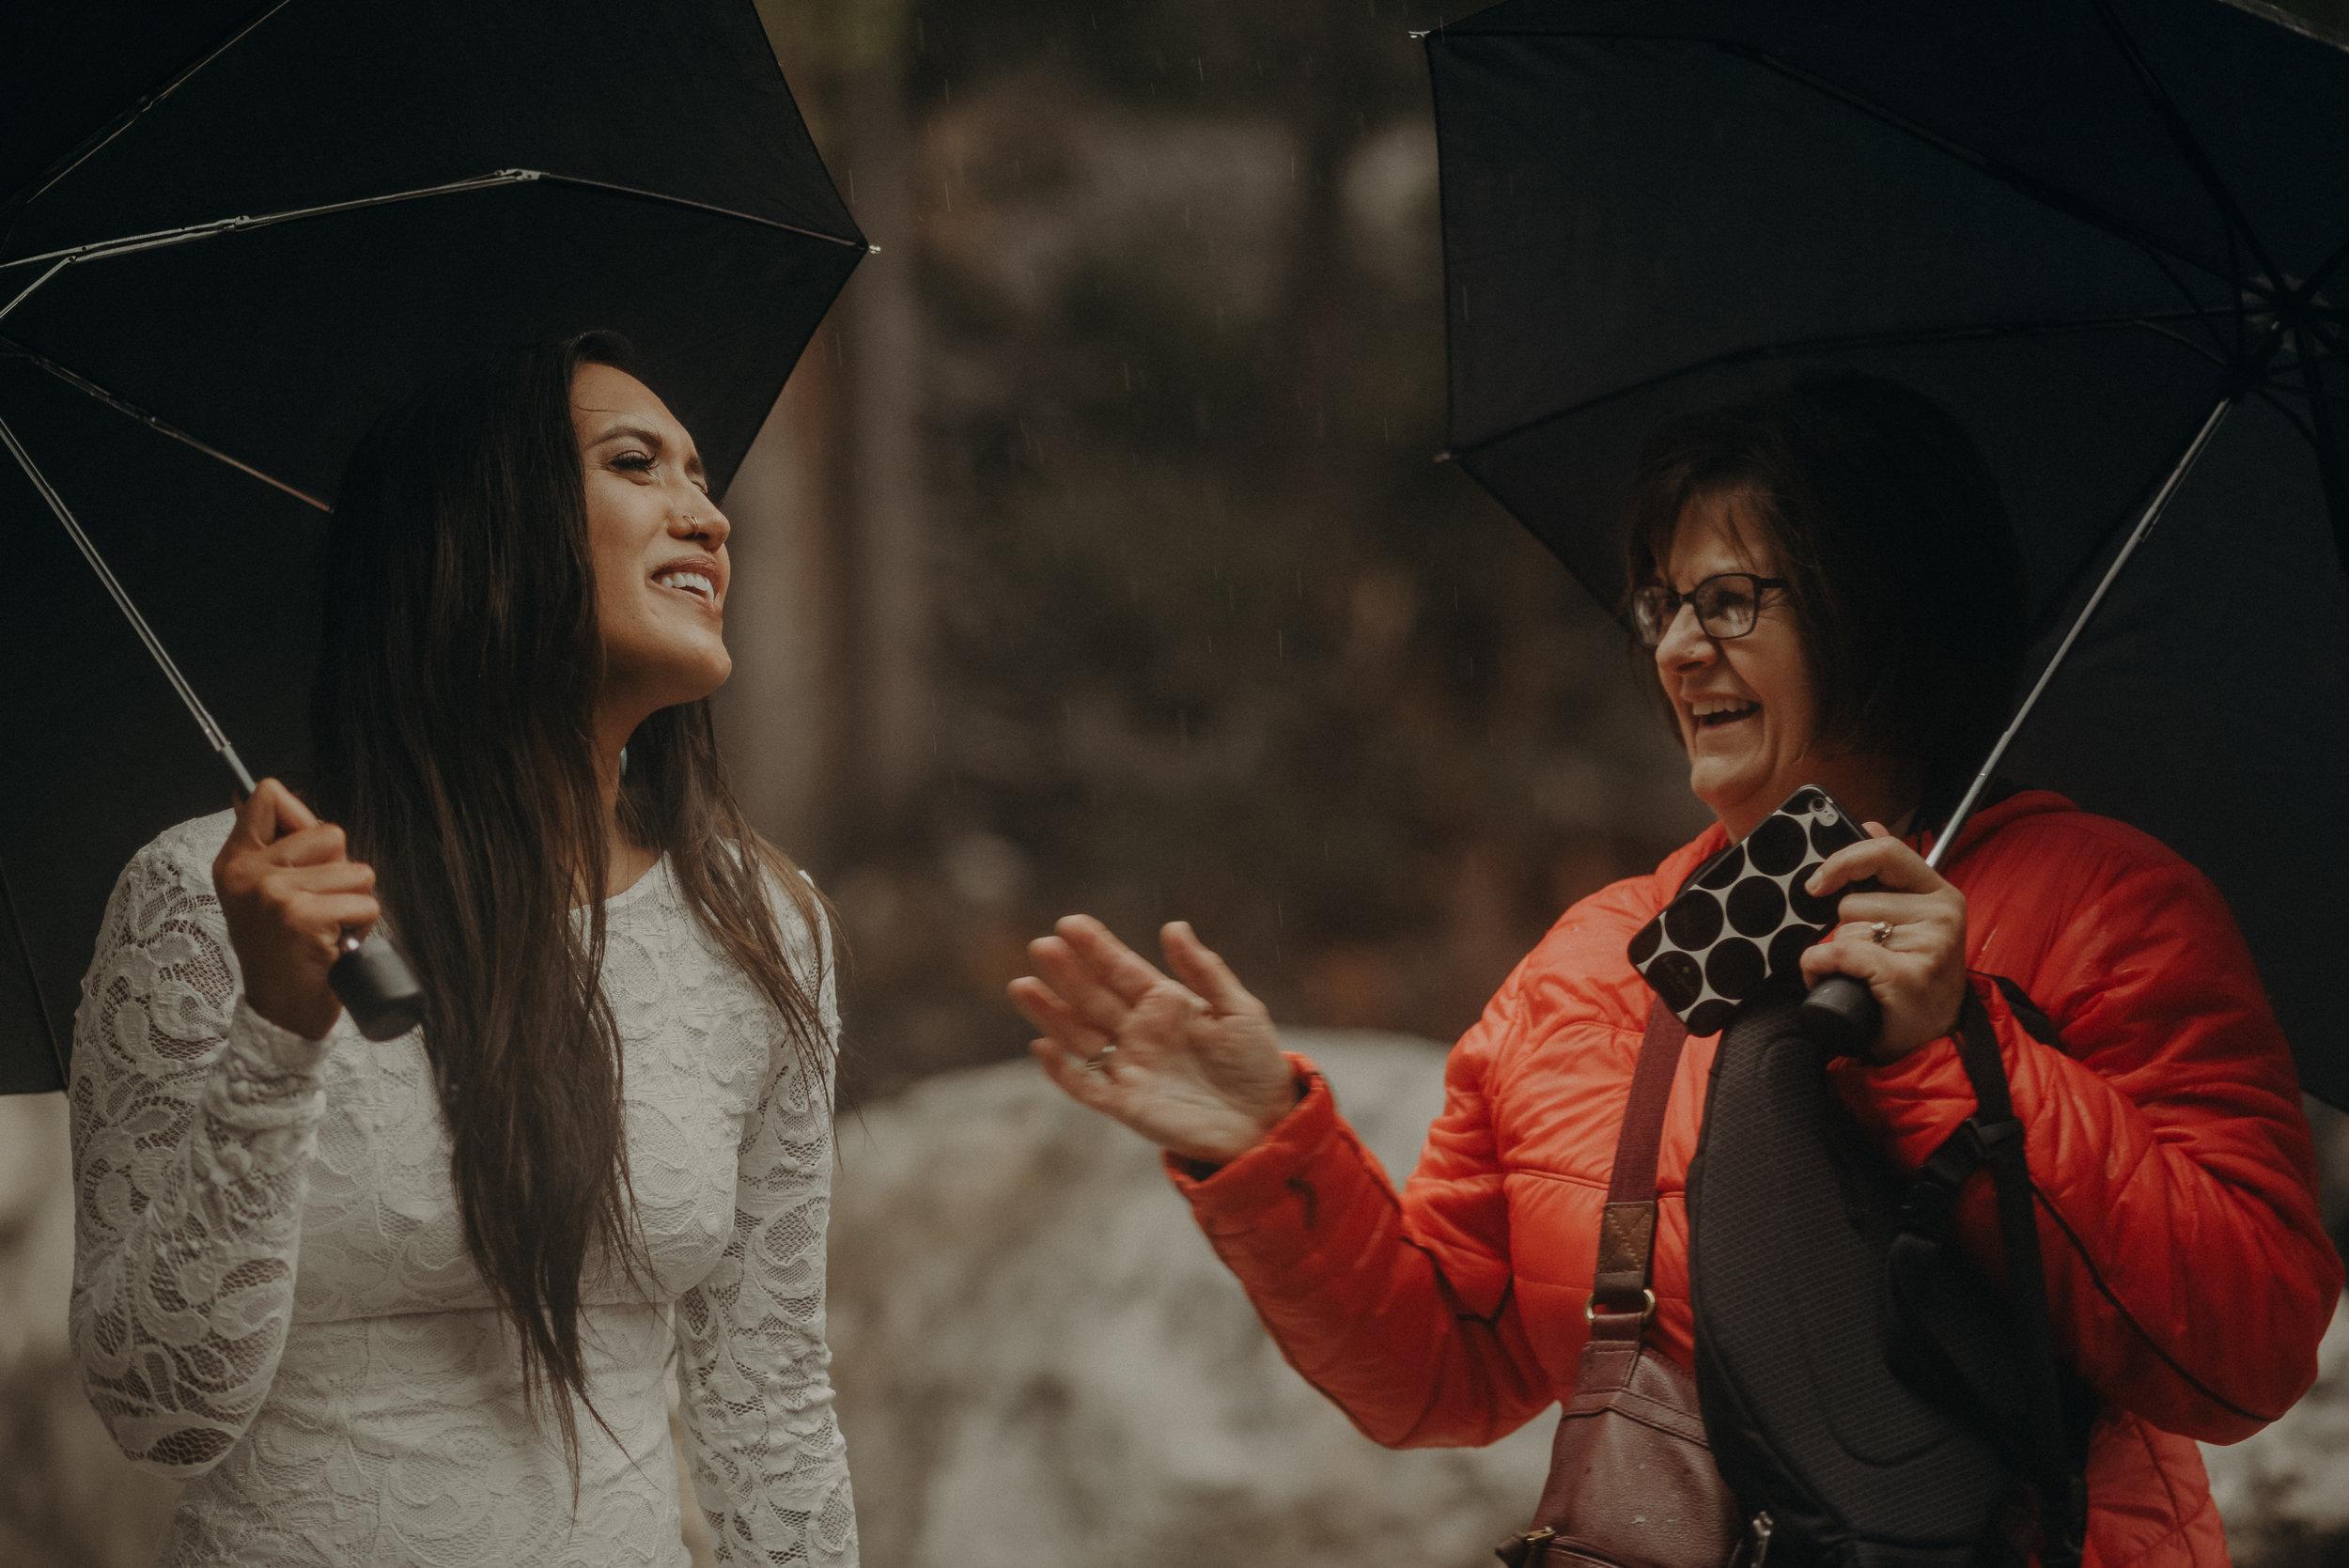 Isaiah + Taylor Photography - Yosemite Elopement - Los Angeles Wedding Photographer-38.jpg